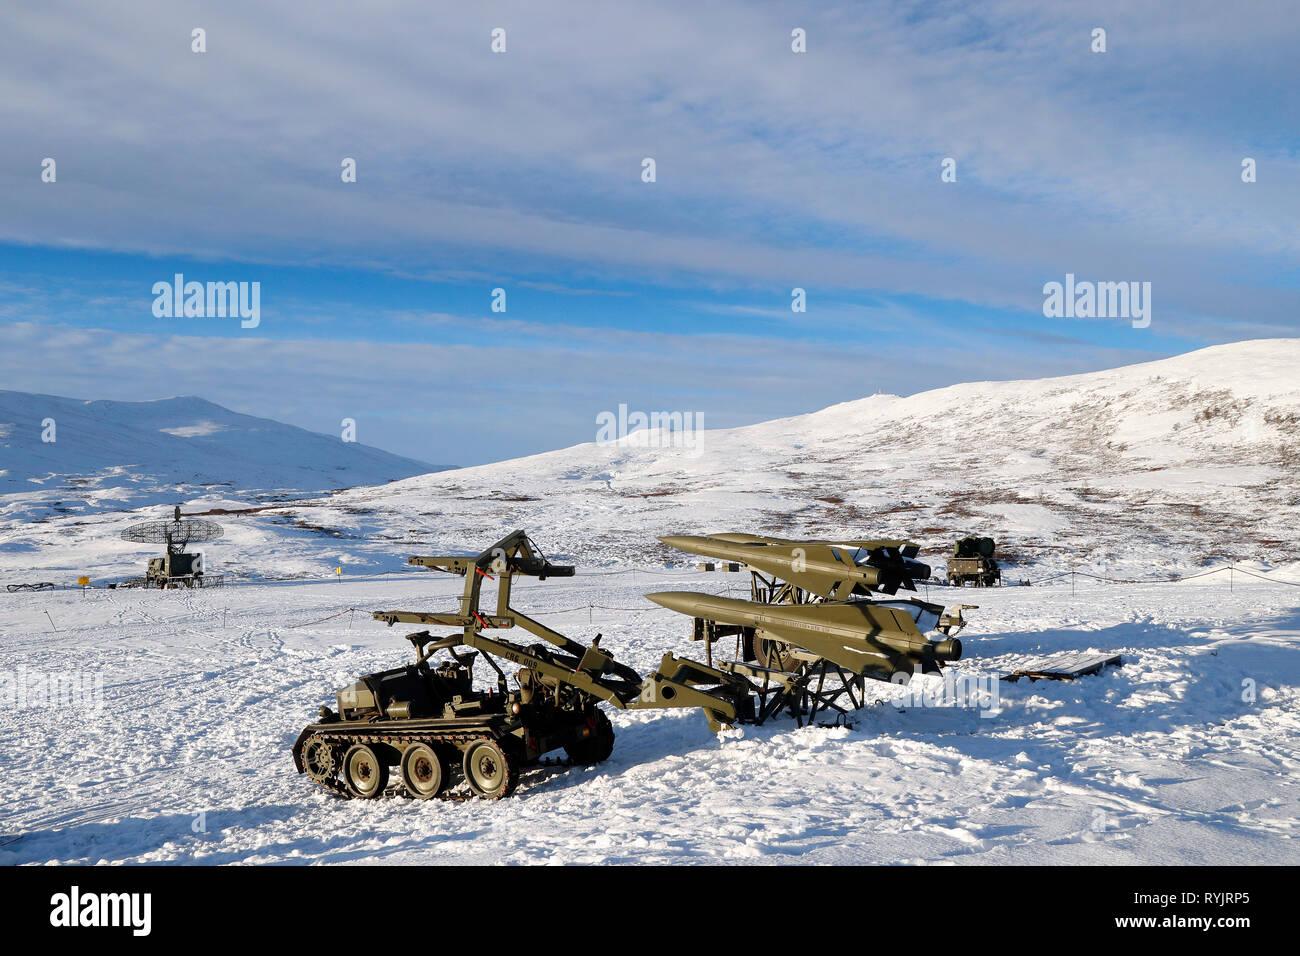 DovrefjellÐSunndalsfjella National Park.  NATO military base.  Surface-to-air missile. Norway. - Stock Image